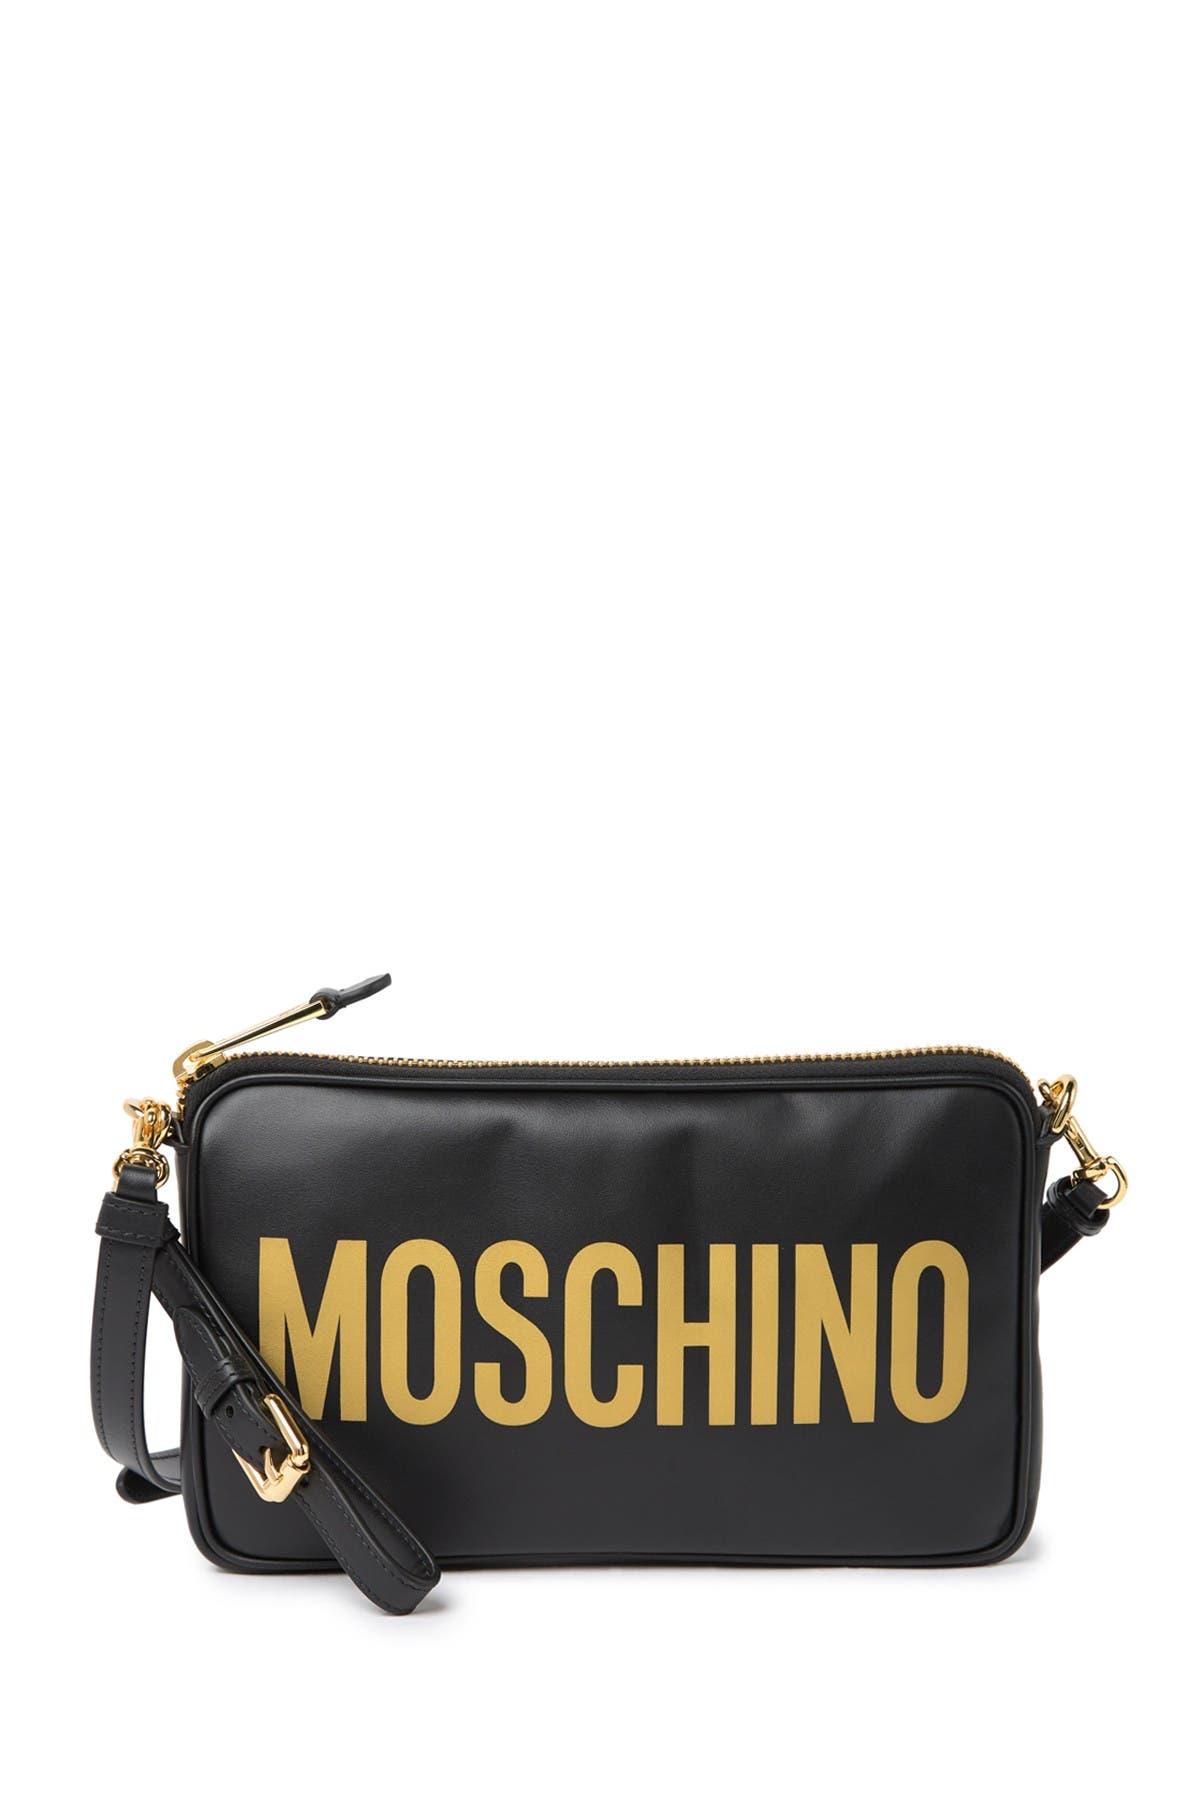 Image of MOSCHINO Logo Crossbody Bag